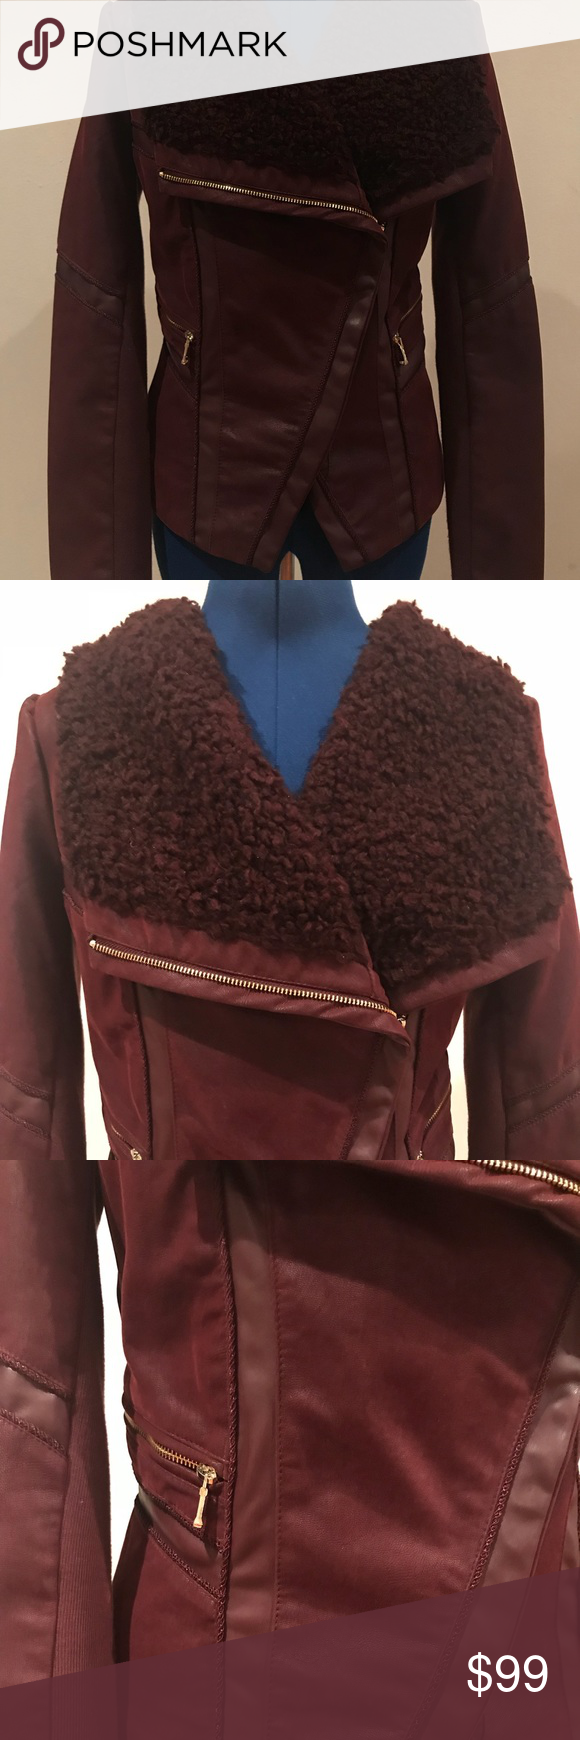 Guess burgundy faux leather/fur jacket size S Excellent